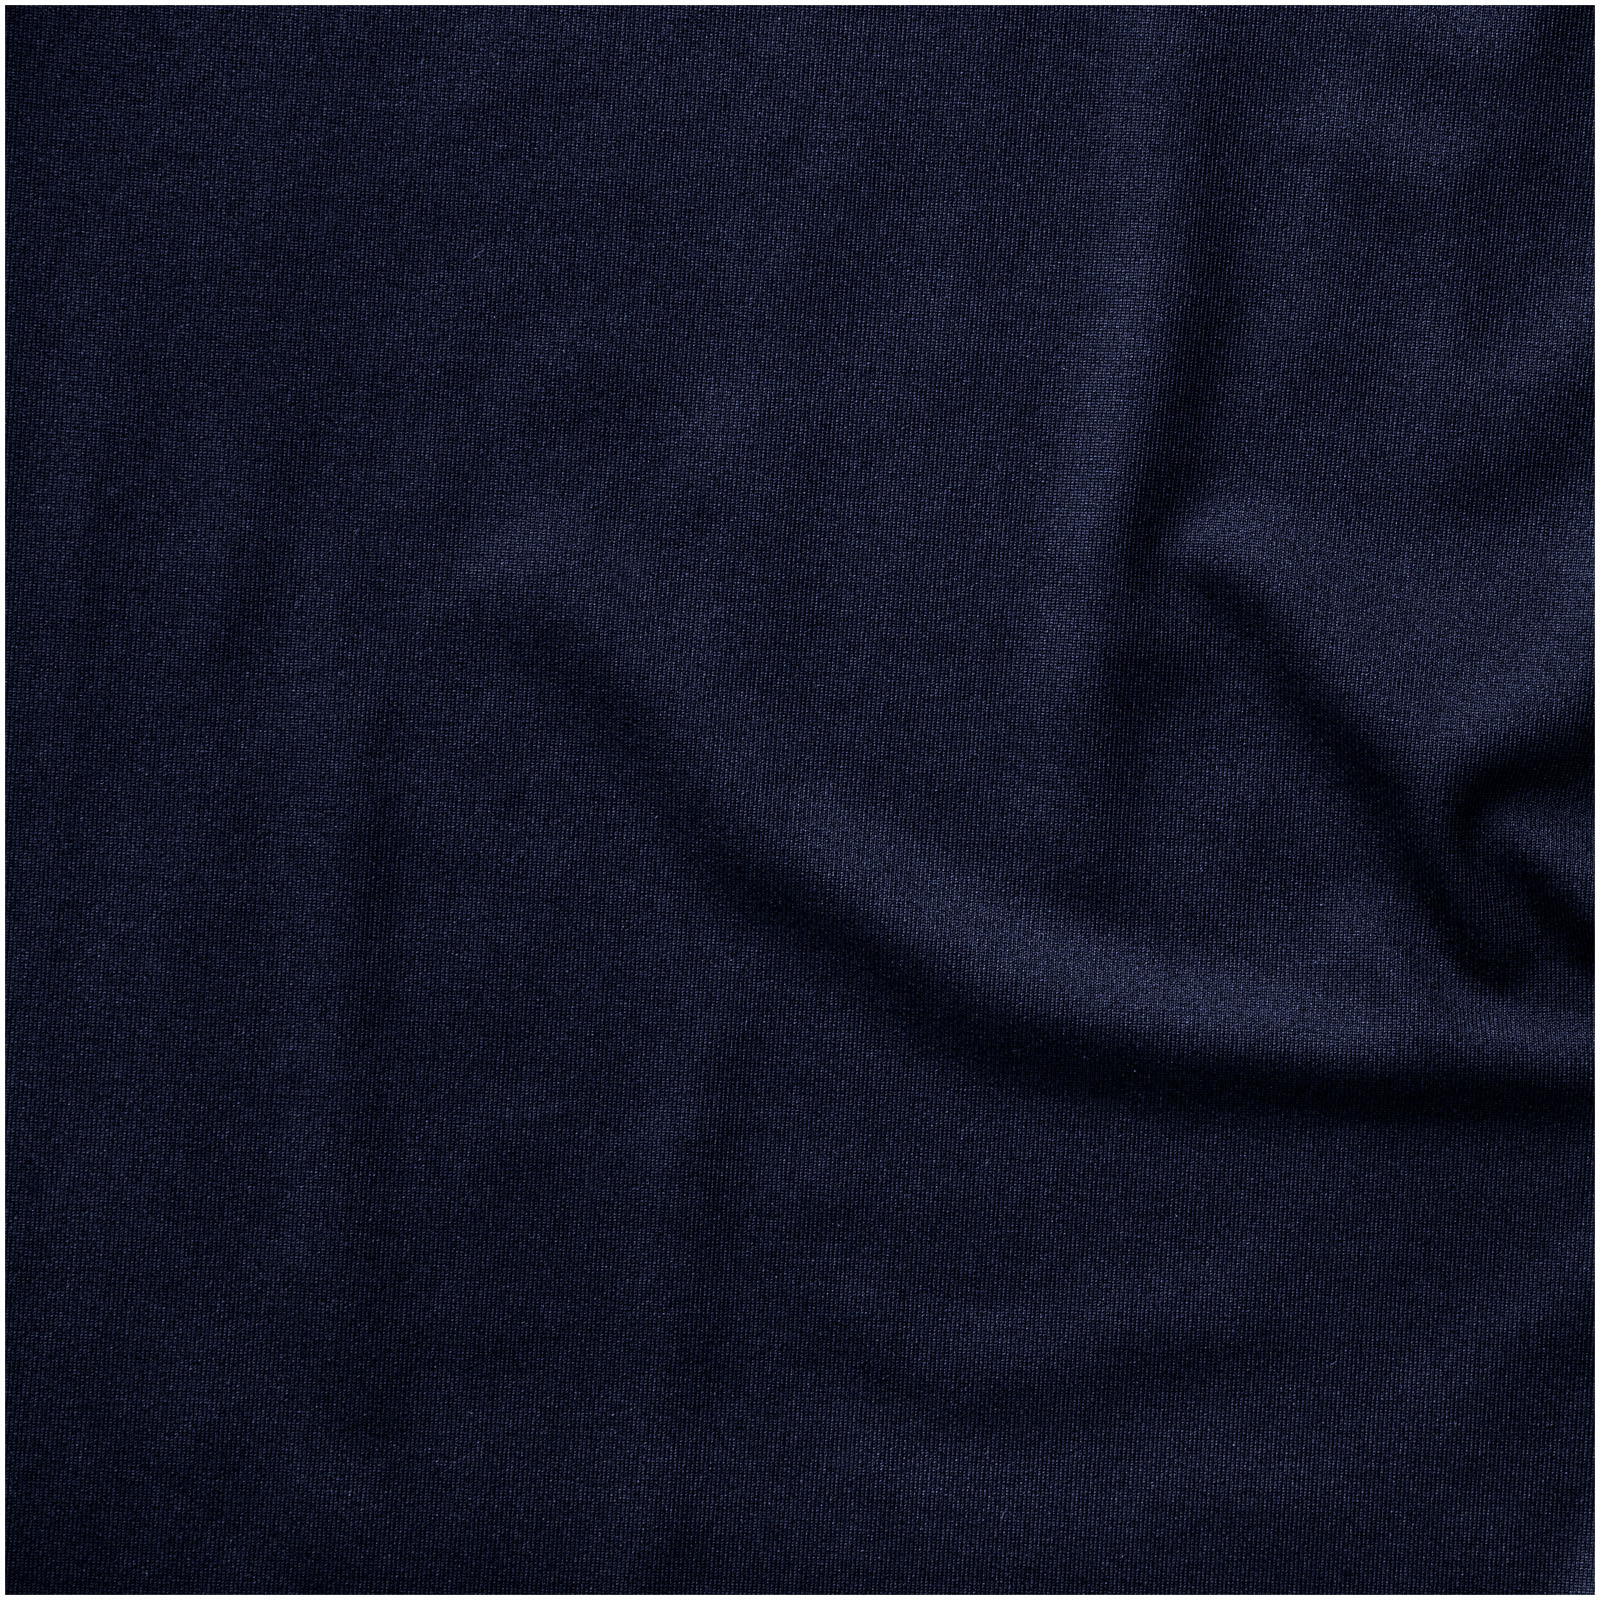 Kingston short sleeve women's cool fit t-shirt